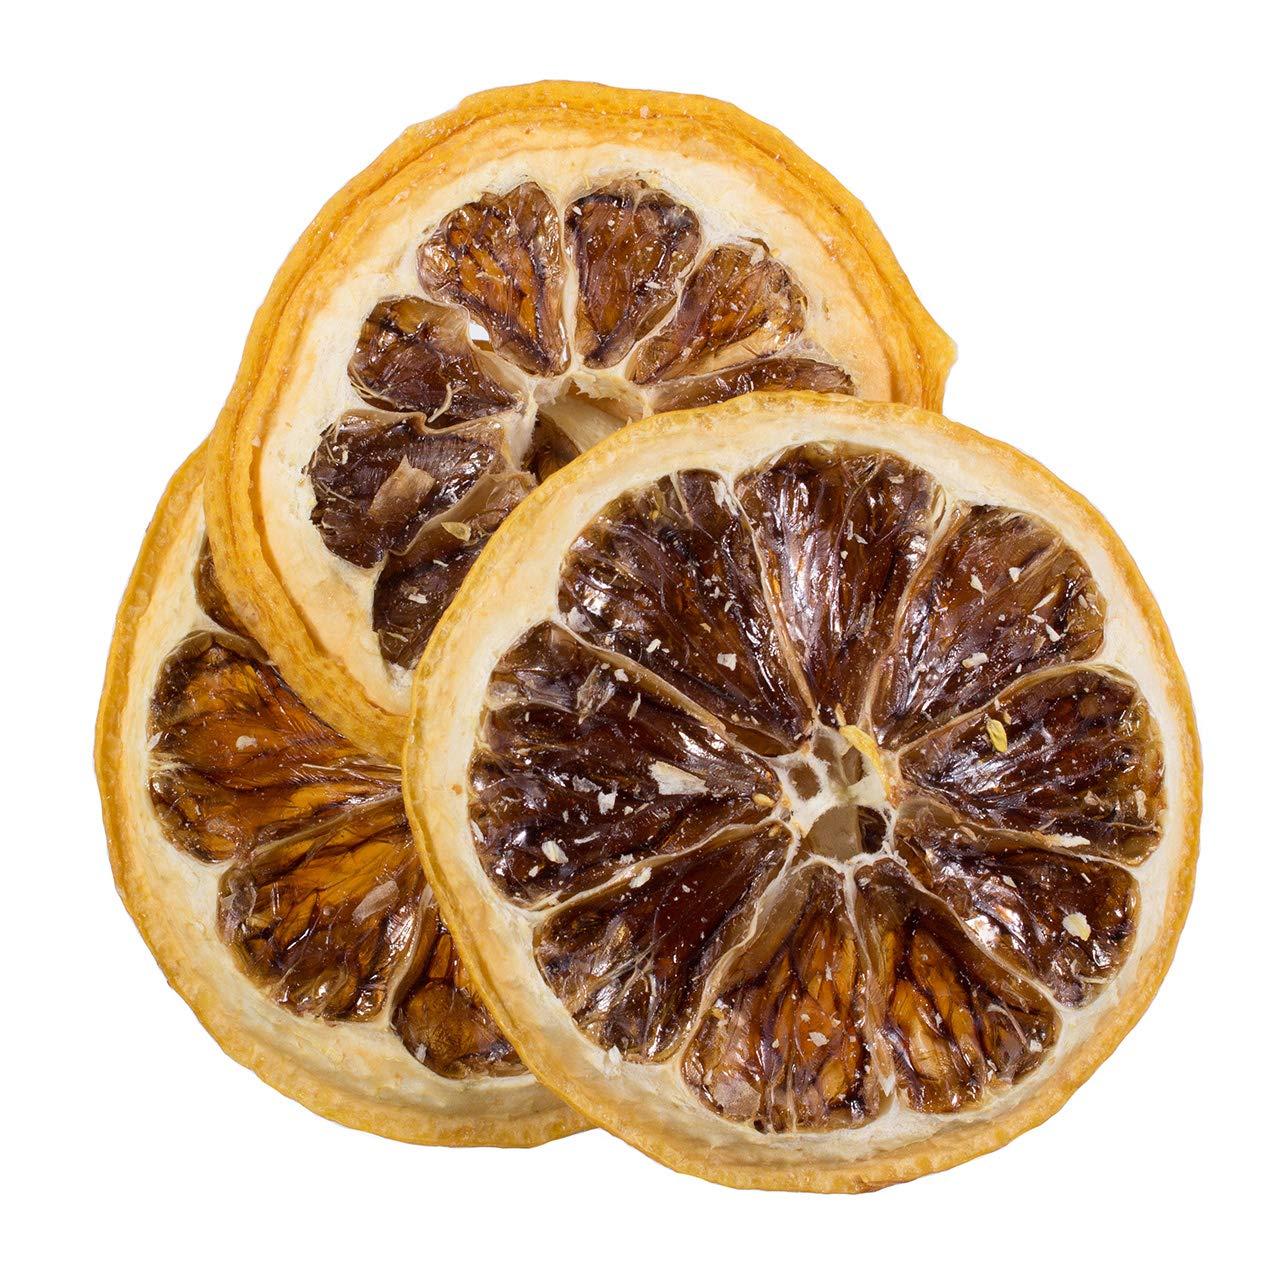 Bella Viva Orchards Natural Dried Lemon Slices, No Sugar Added, 1 lb of Dried Fruit